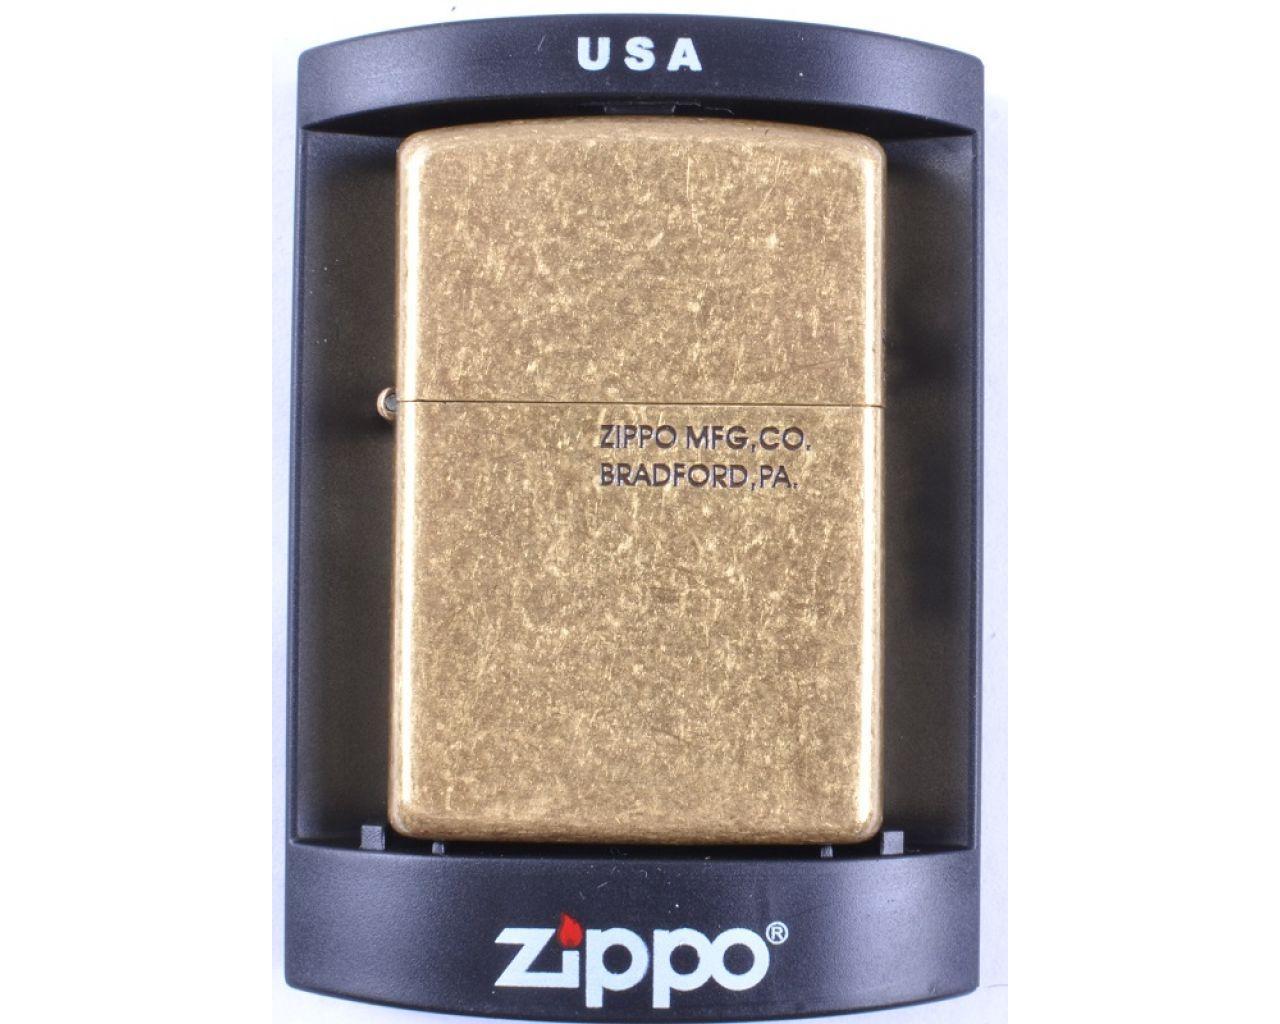 Зажигалка бензиновая Zippo MFG,CO.BRADFORD,PA. №4239